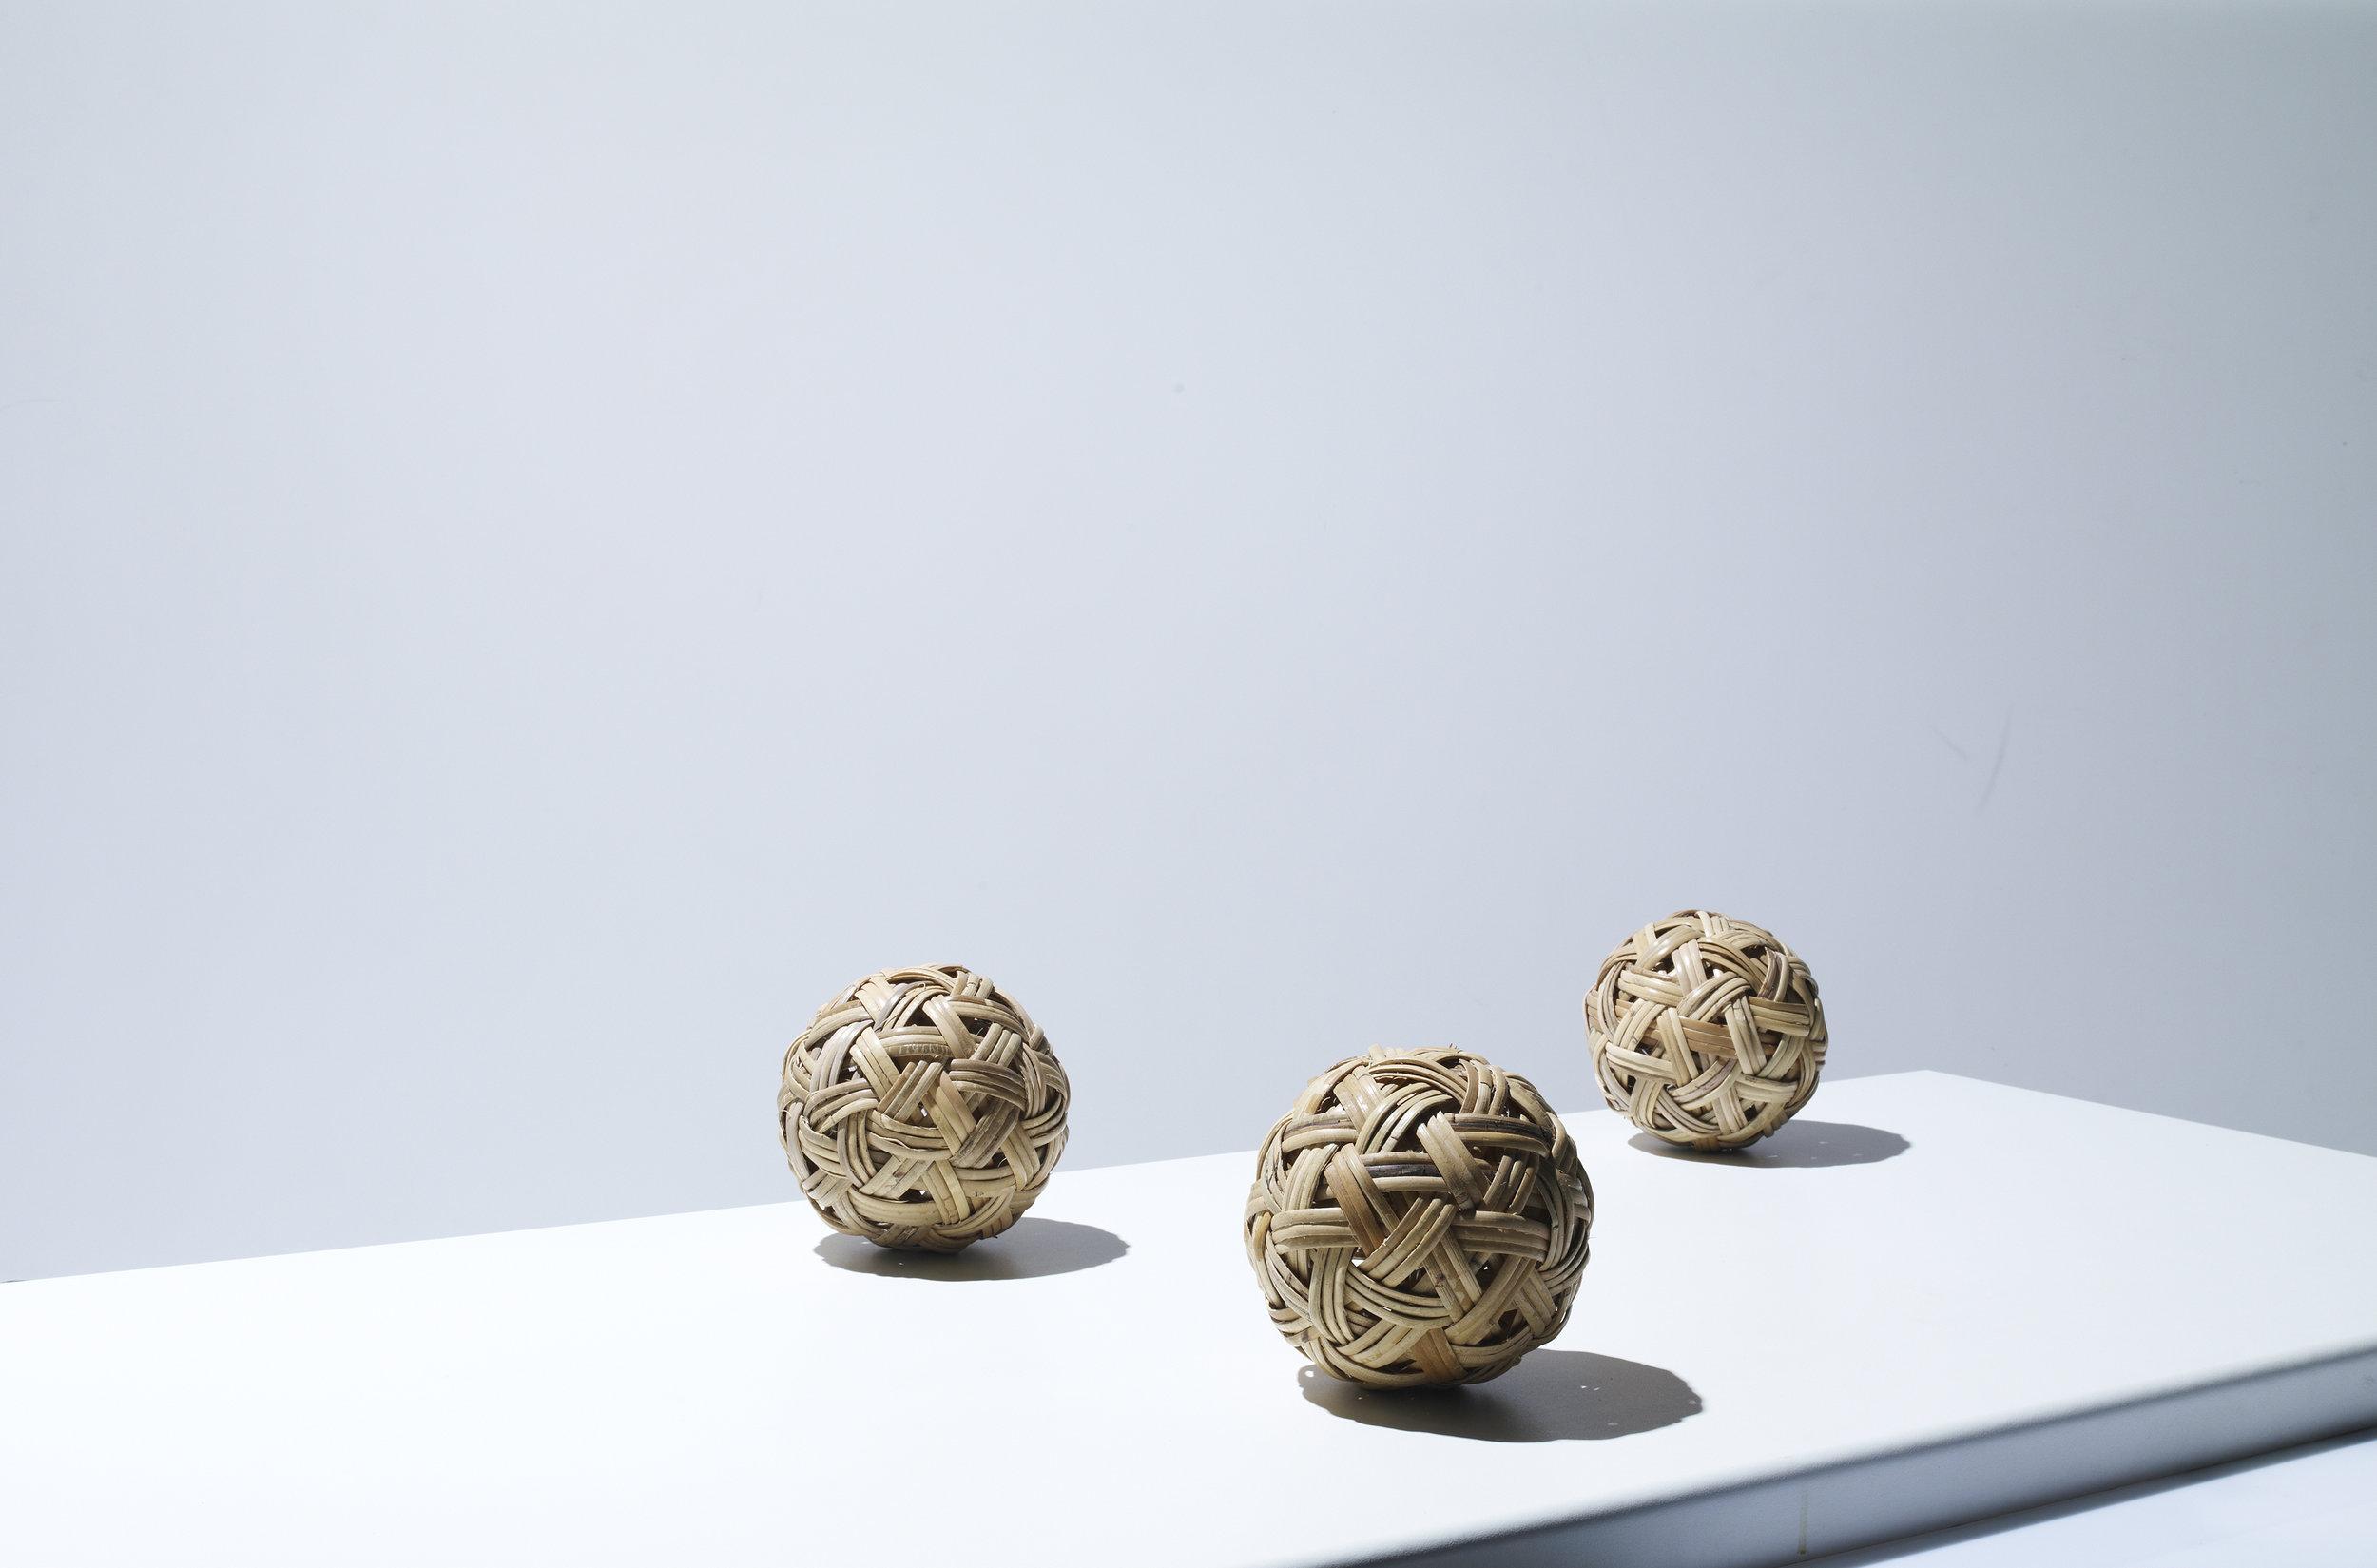 3balls_016.jpg